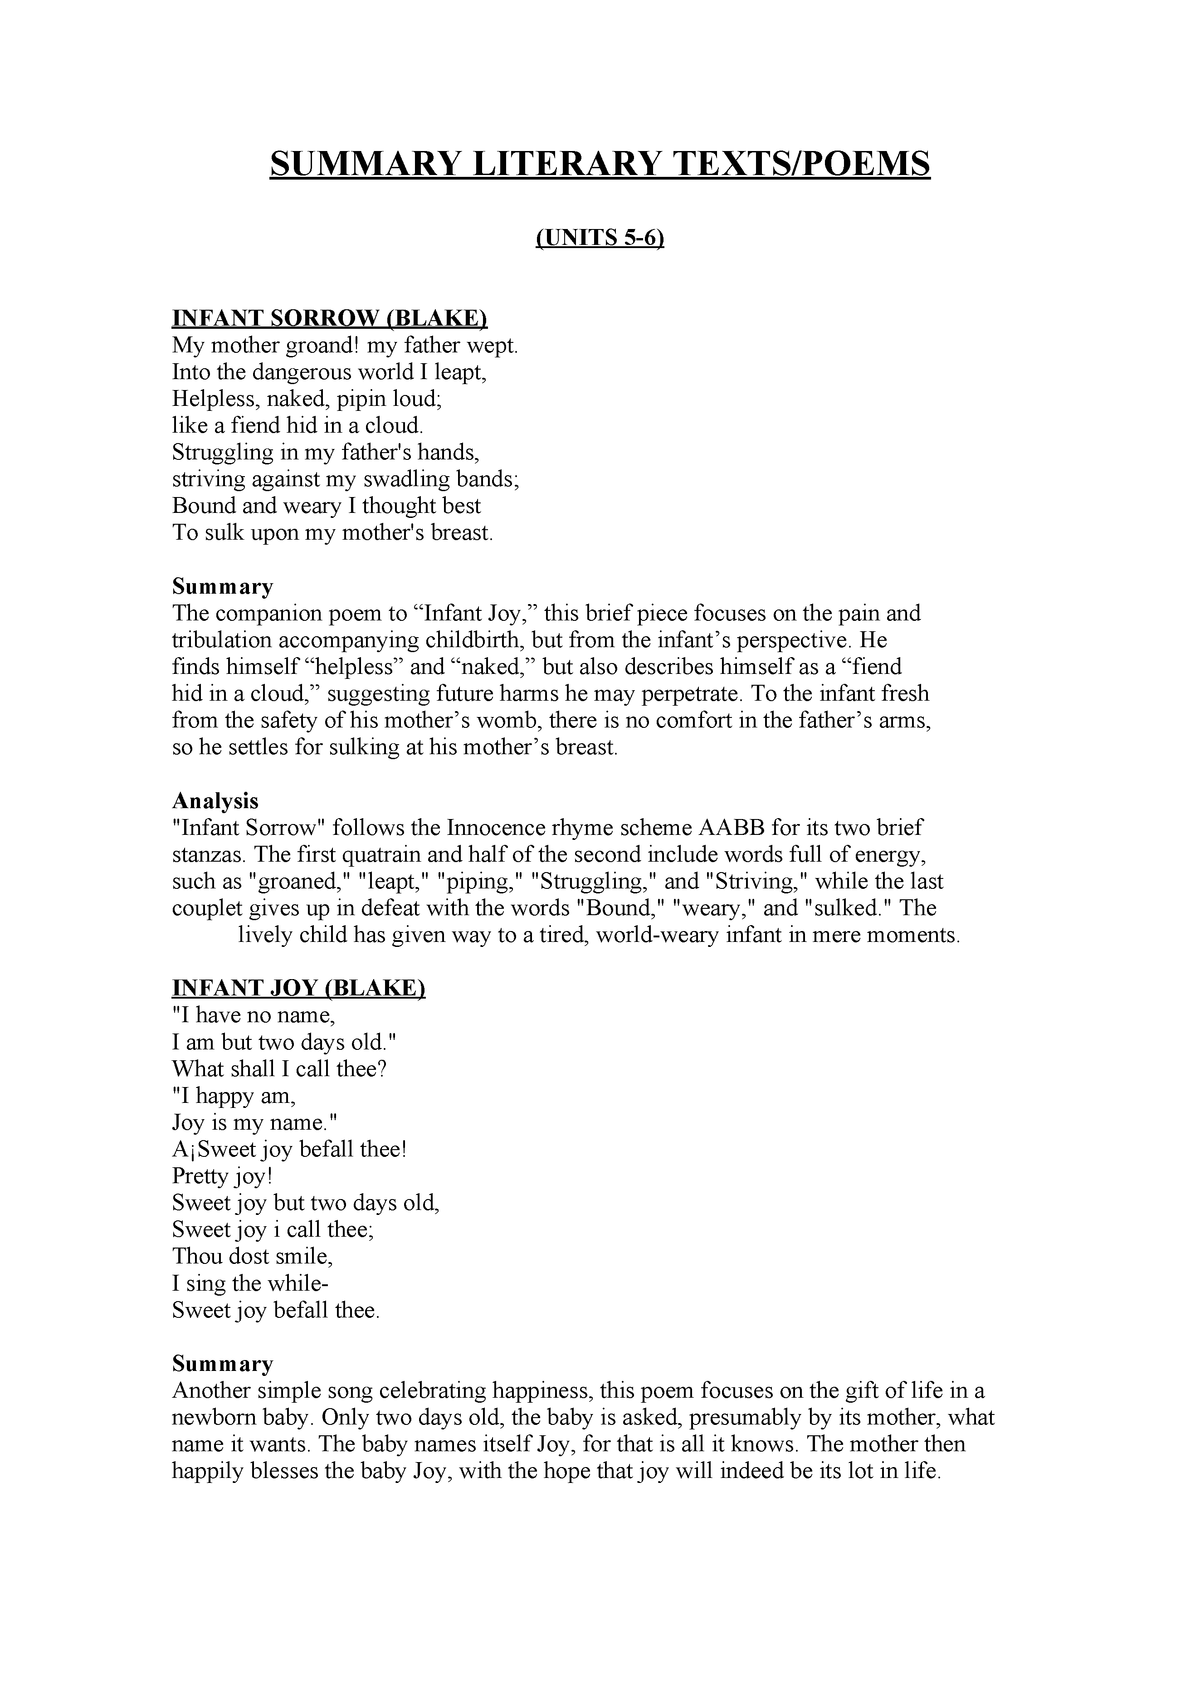 Resúmenes y Análisis Literary Texts - 23304146 - StuDocu